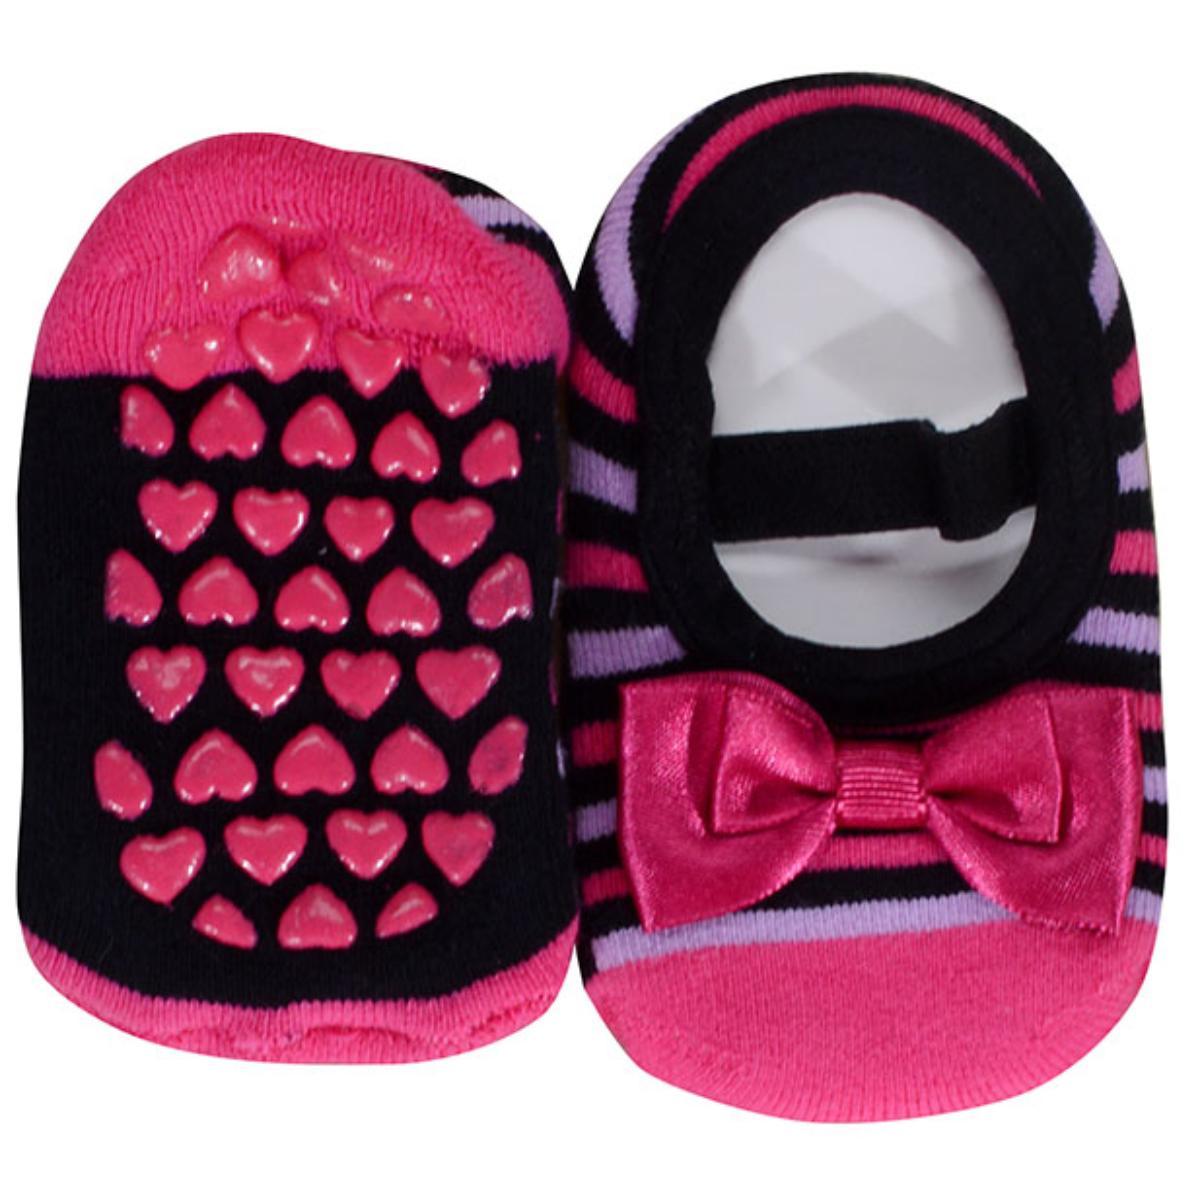 Meia Sapatilha Fem Infantil Lupo 2006 017 9990 Pink/preto